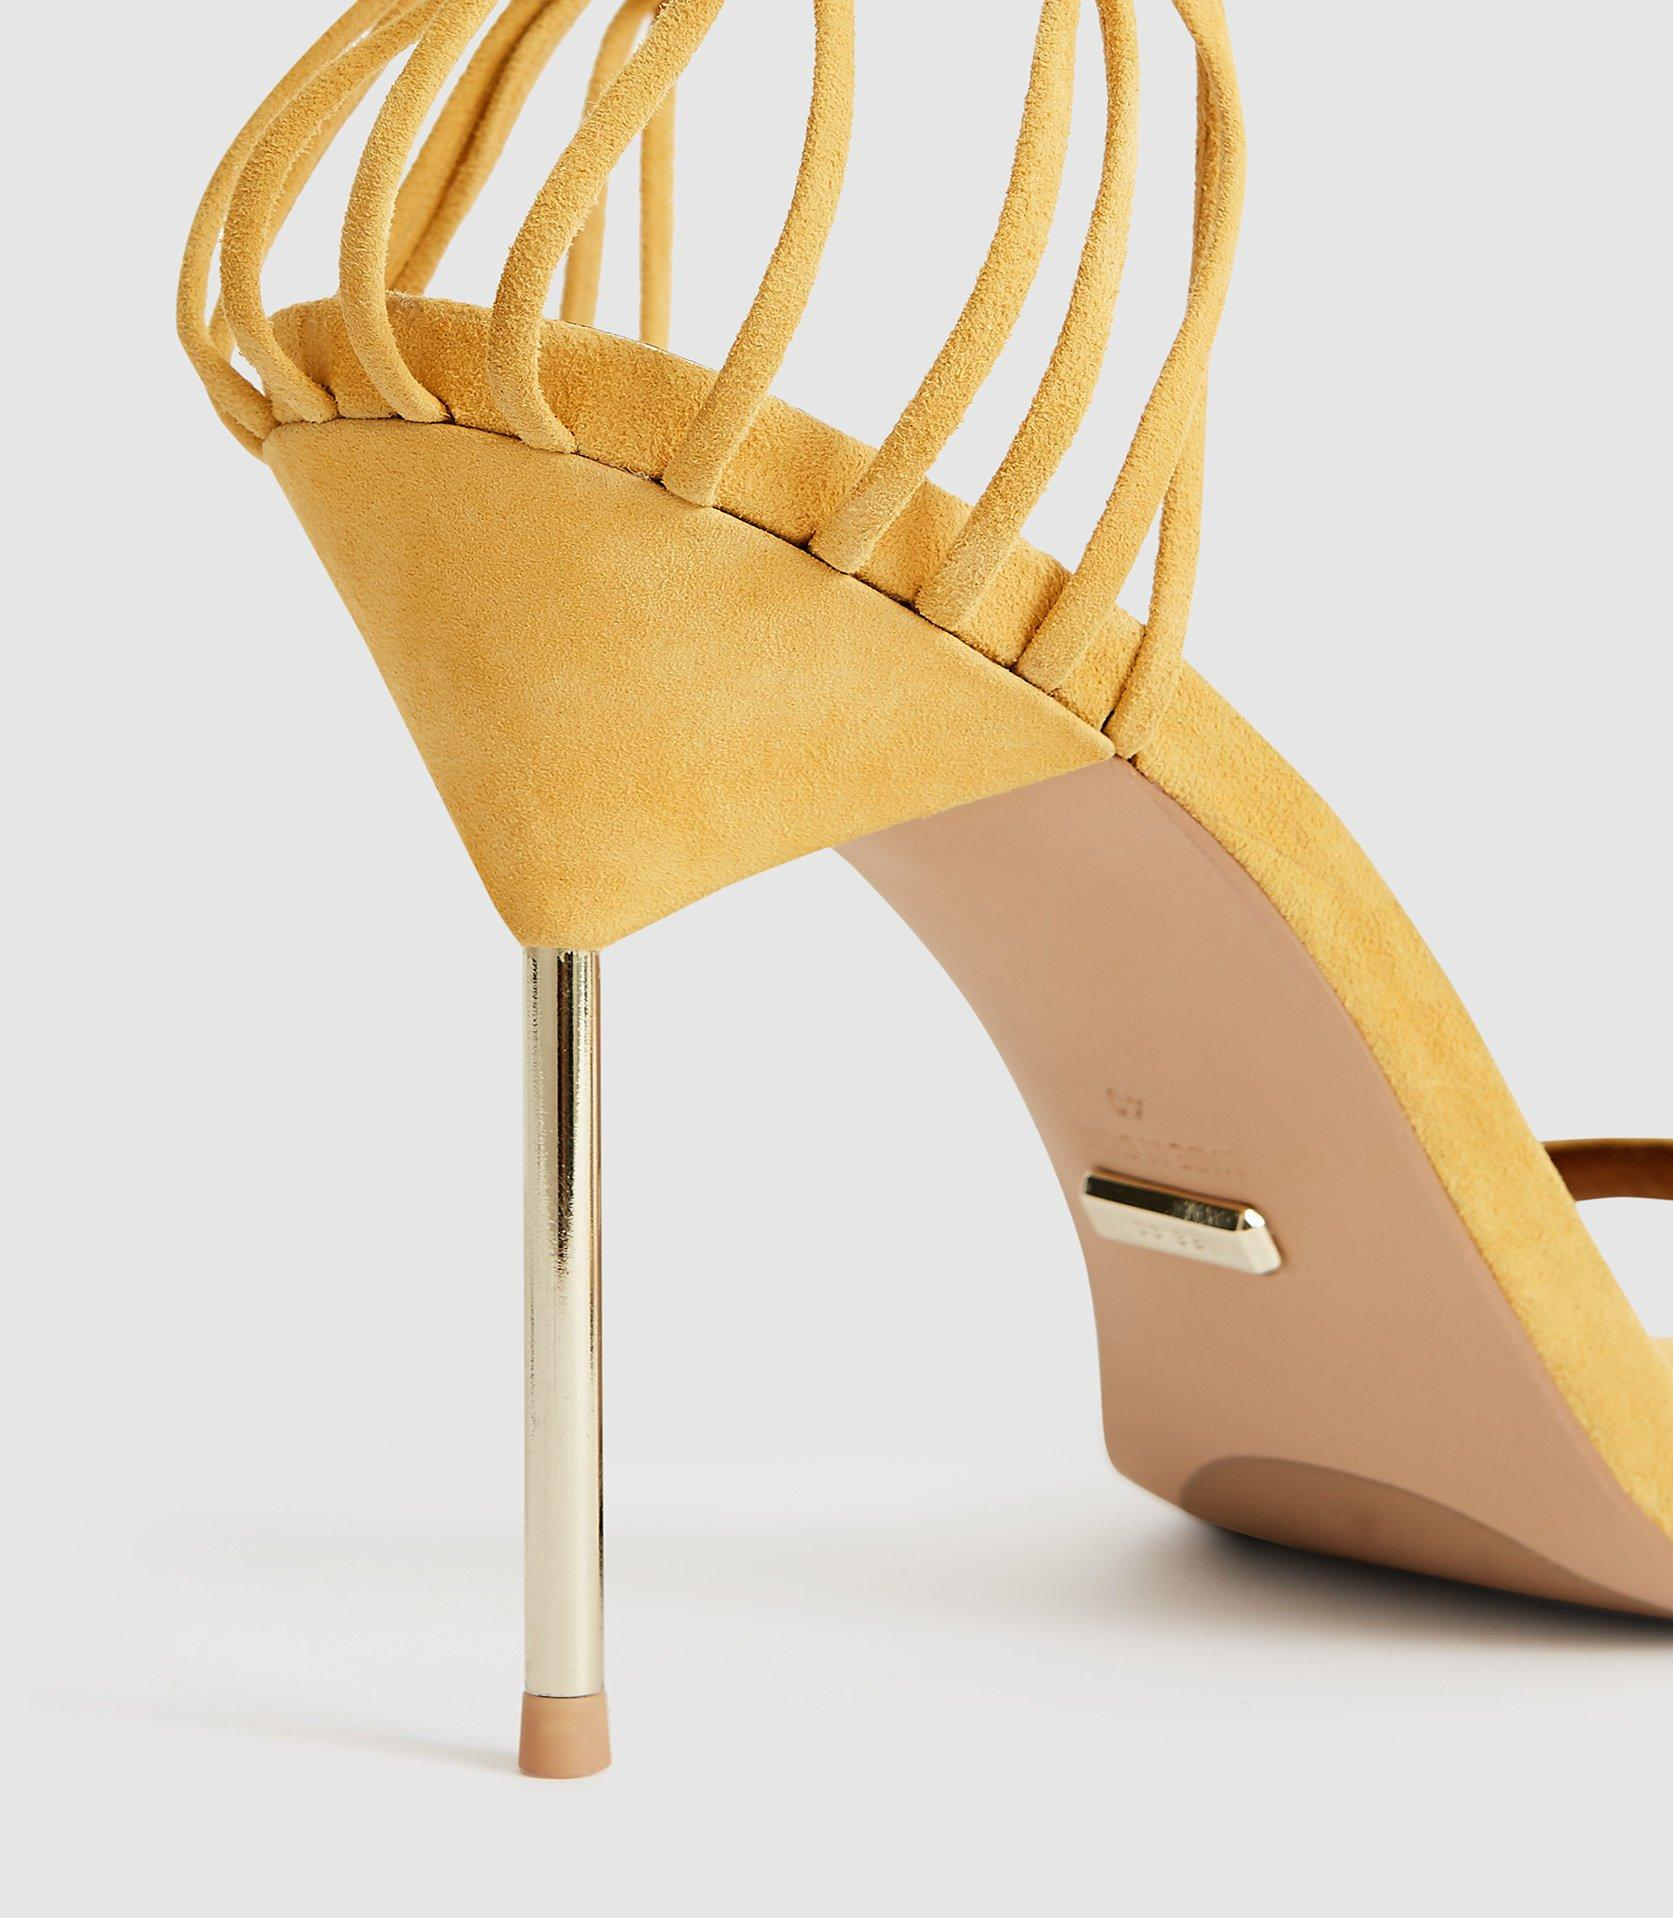 d847255962 Reiss - Metallic Zhane - Suede Strappy Wrap Sandals - Lyst. View fullscreen